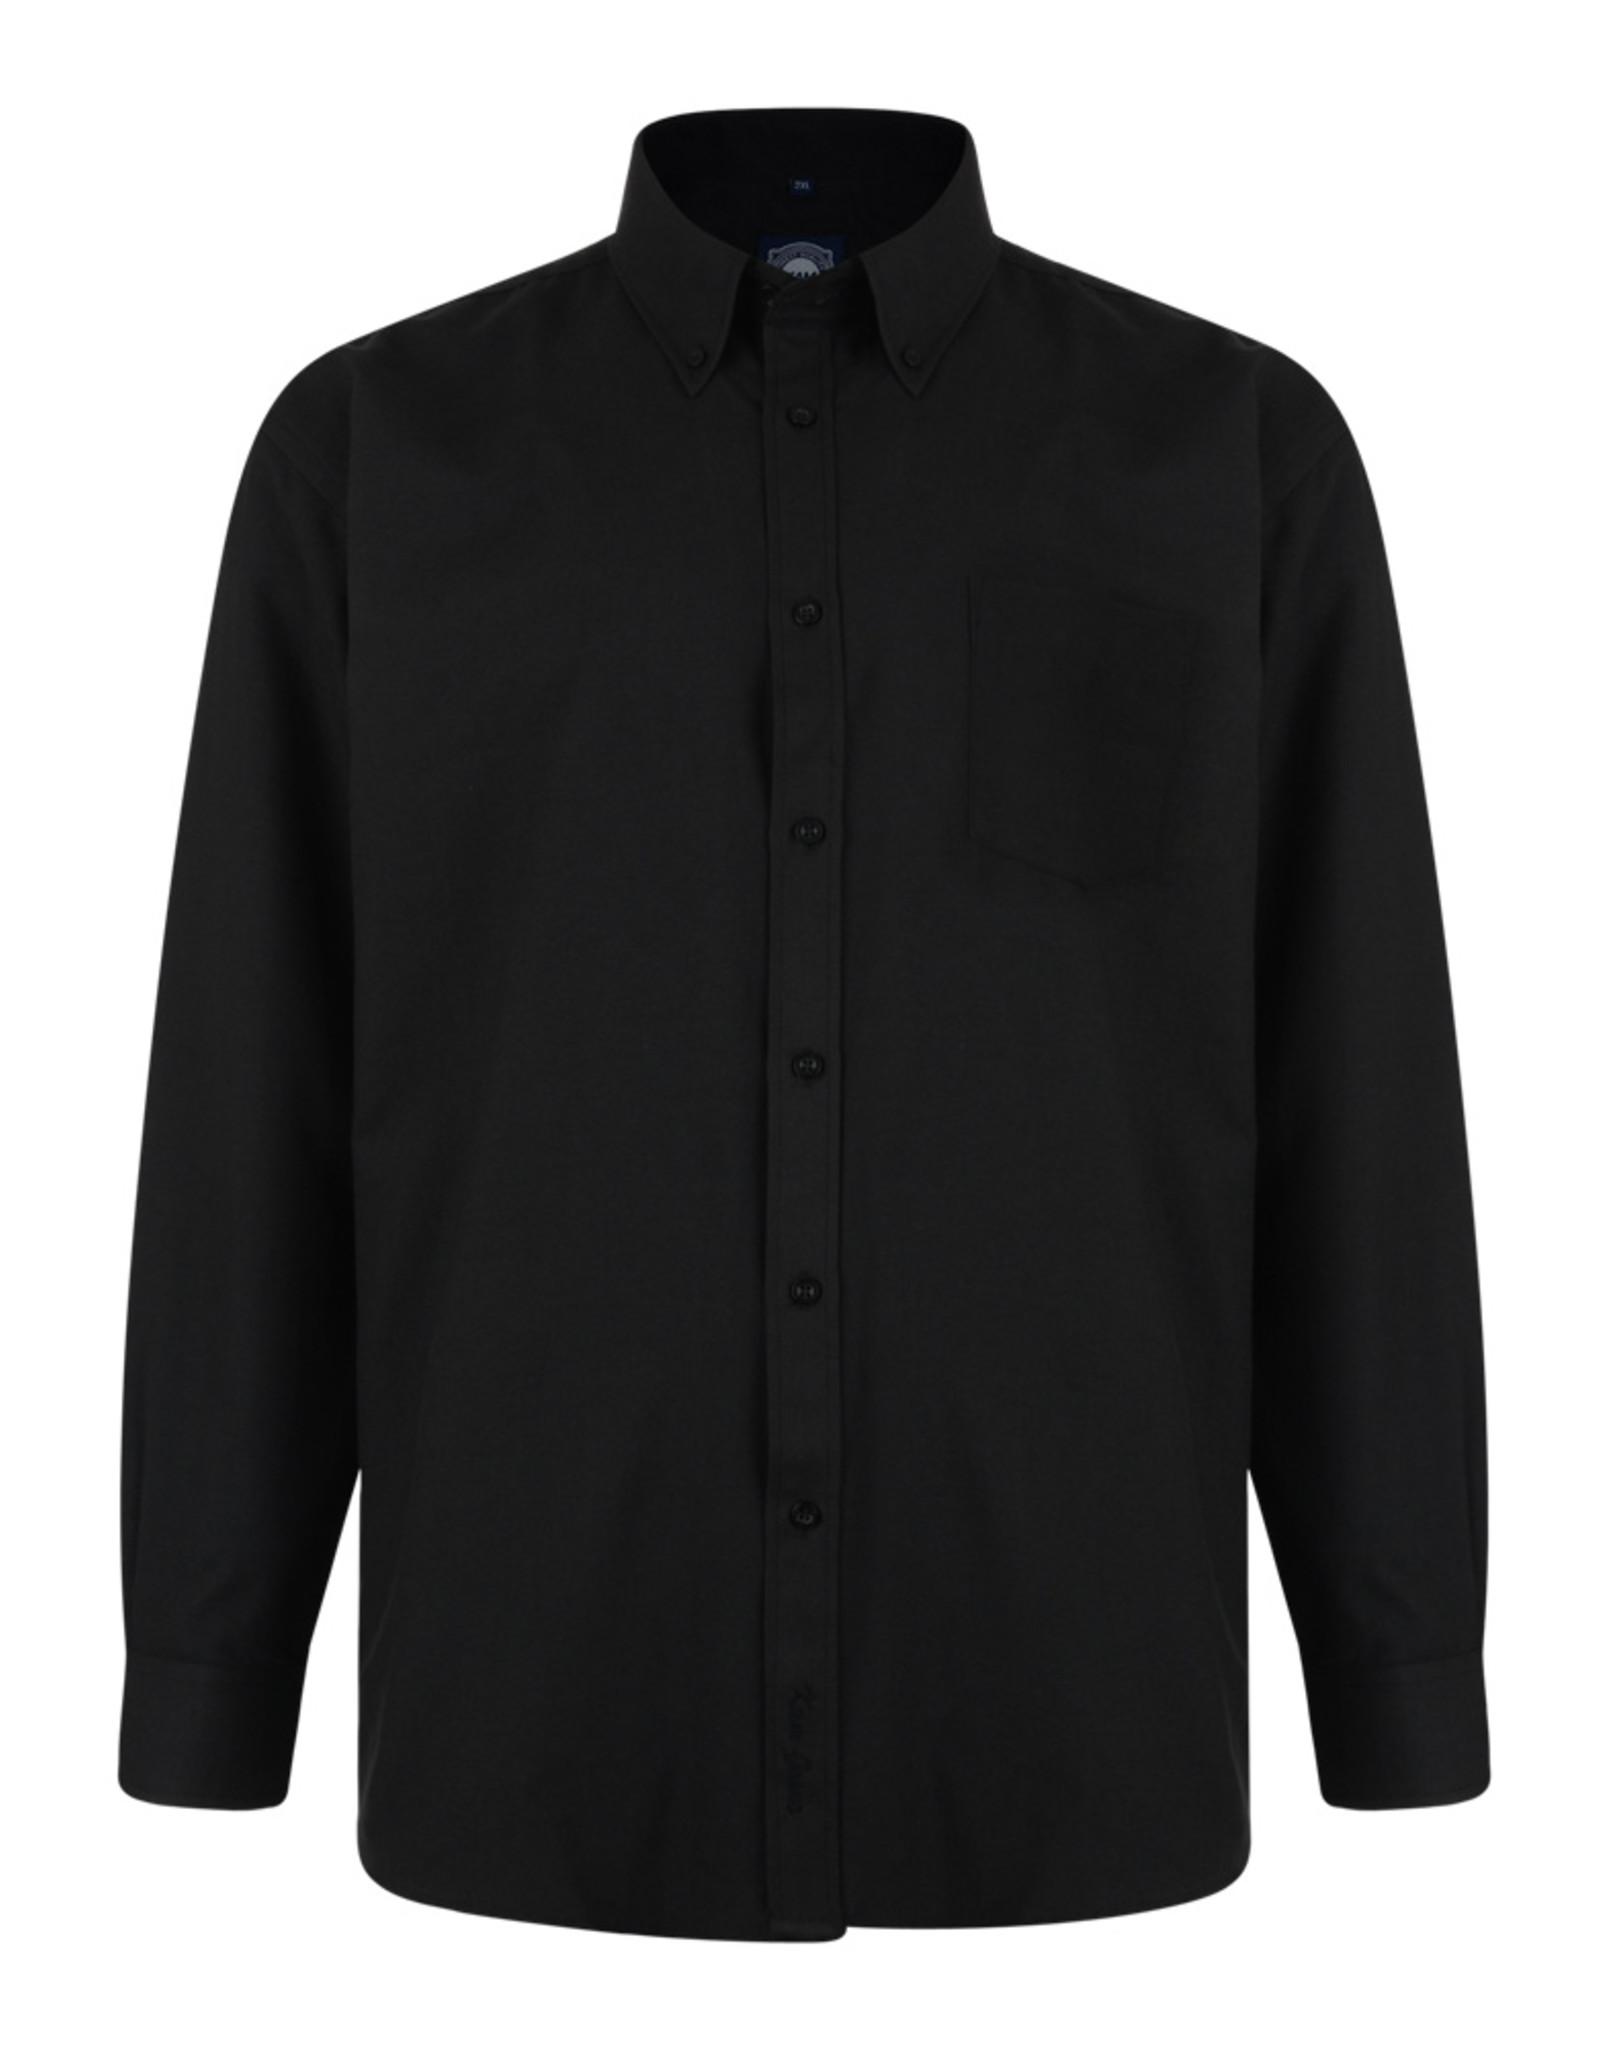 Kam Jeans OVERHEMD Oxford casual lange mouw zwart